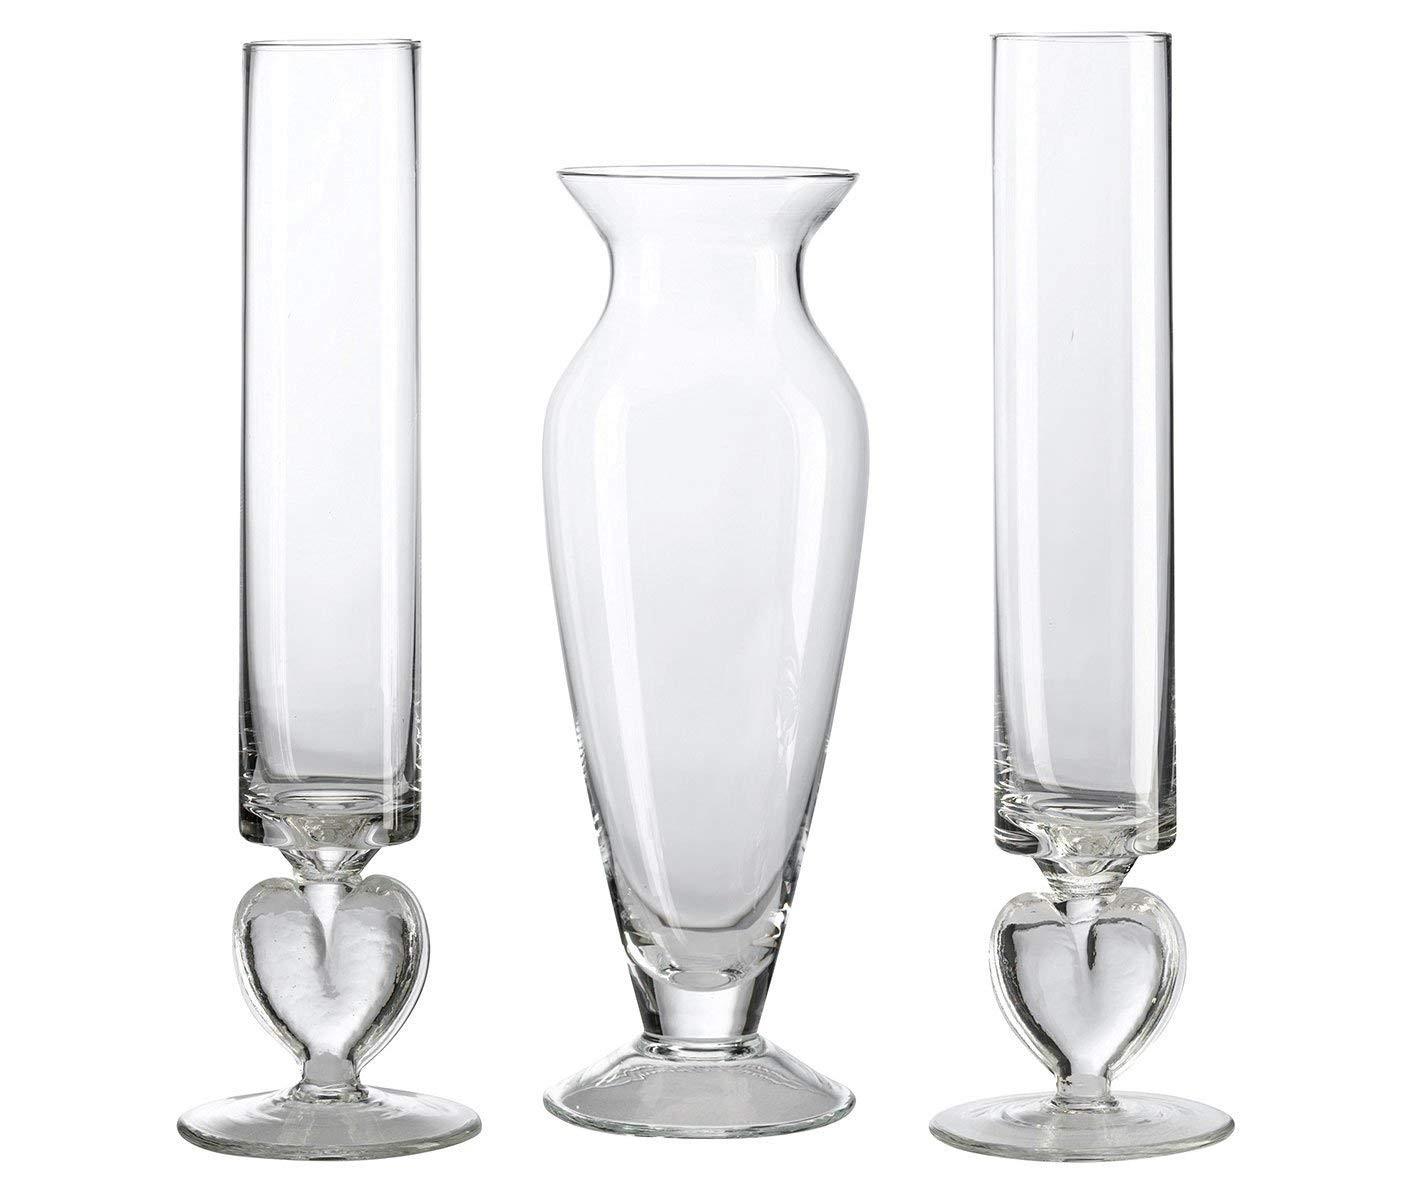 cylinder vases set of 3 of amazon com lillian rose unity sand ceremony wedding vase set home for amazon com lillian rose unity sand ceremony wedding vase set home kitchen